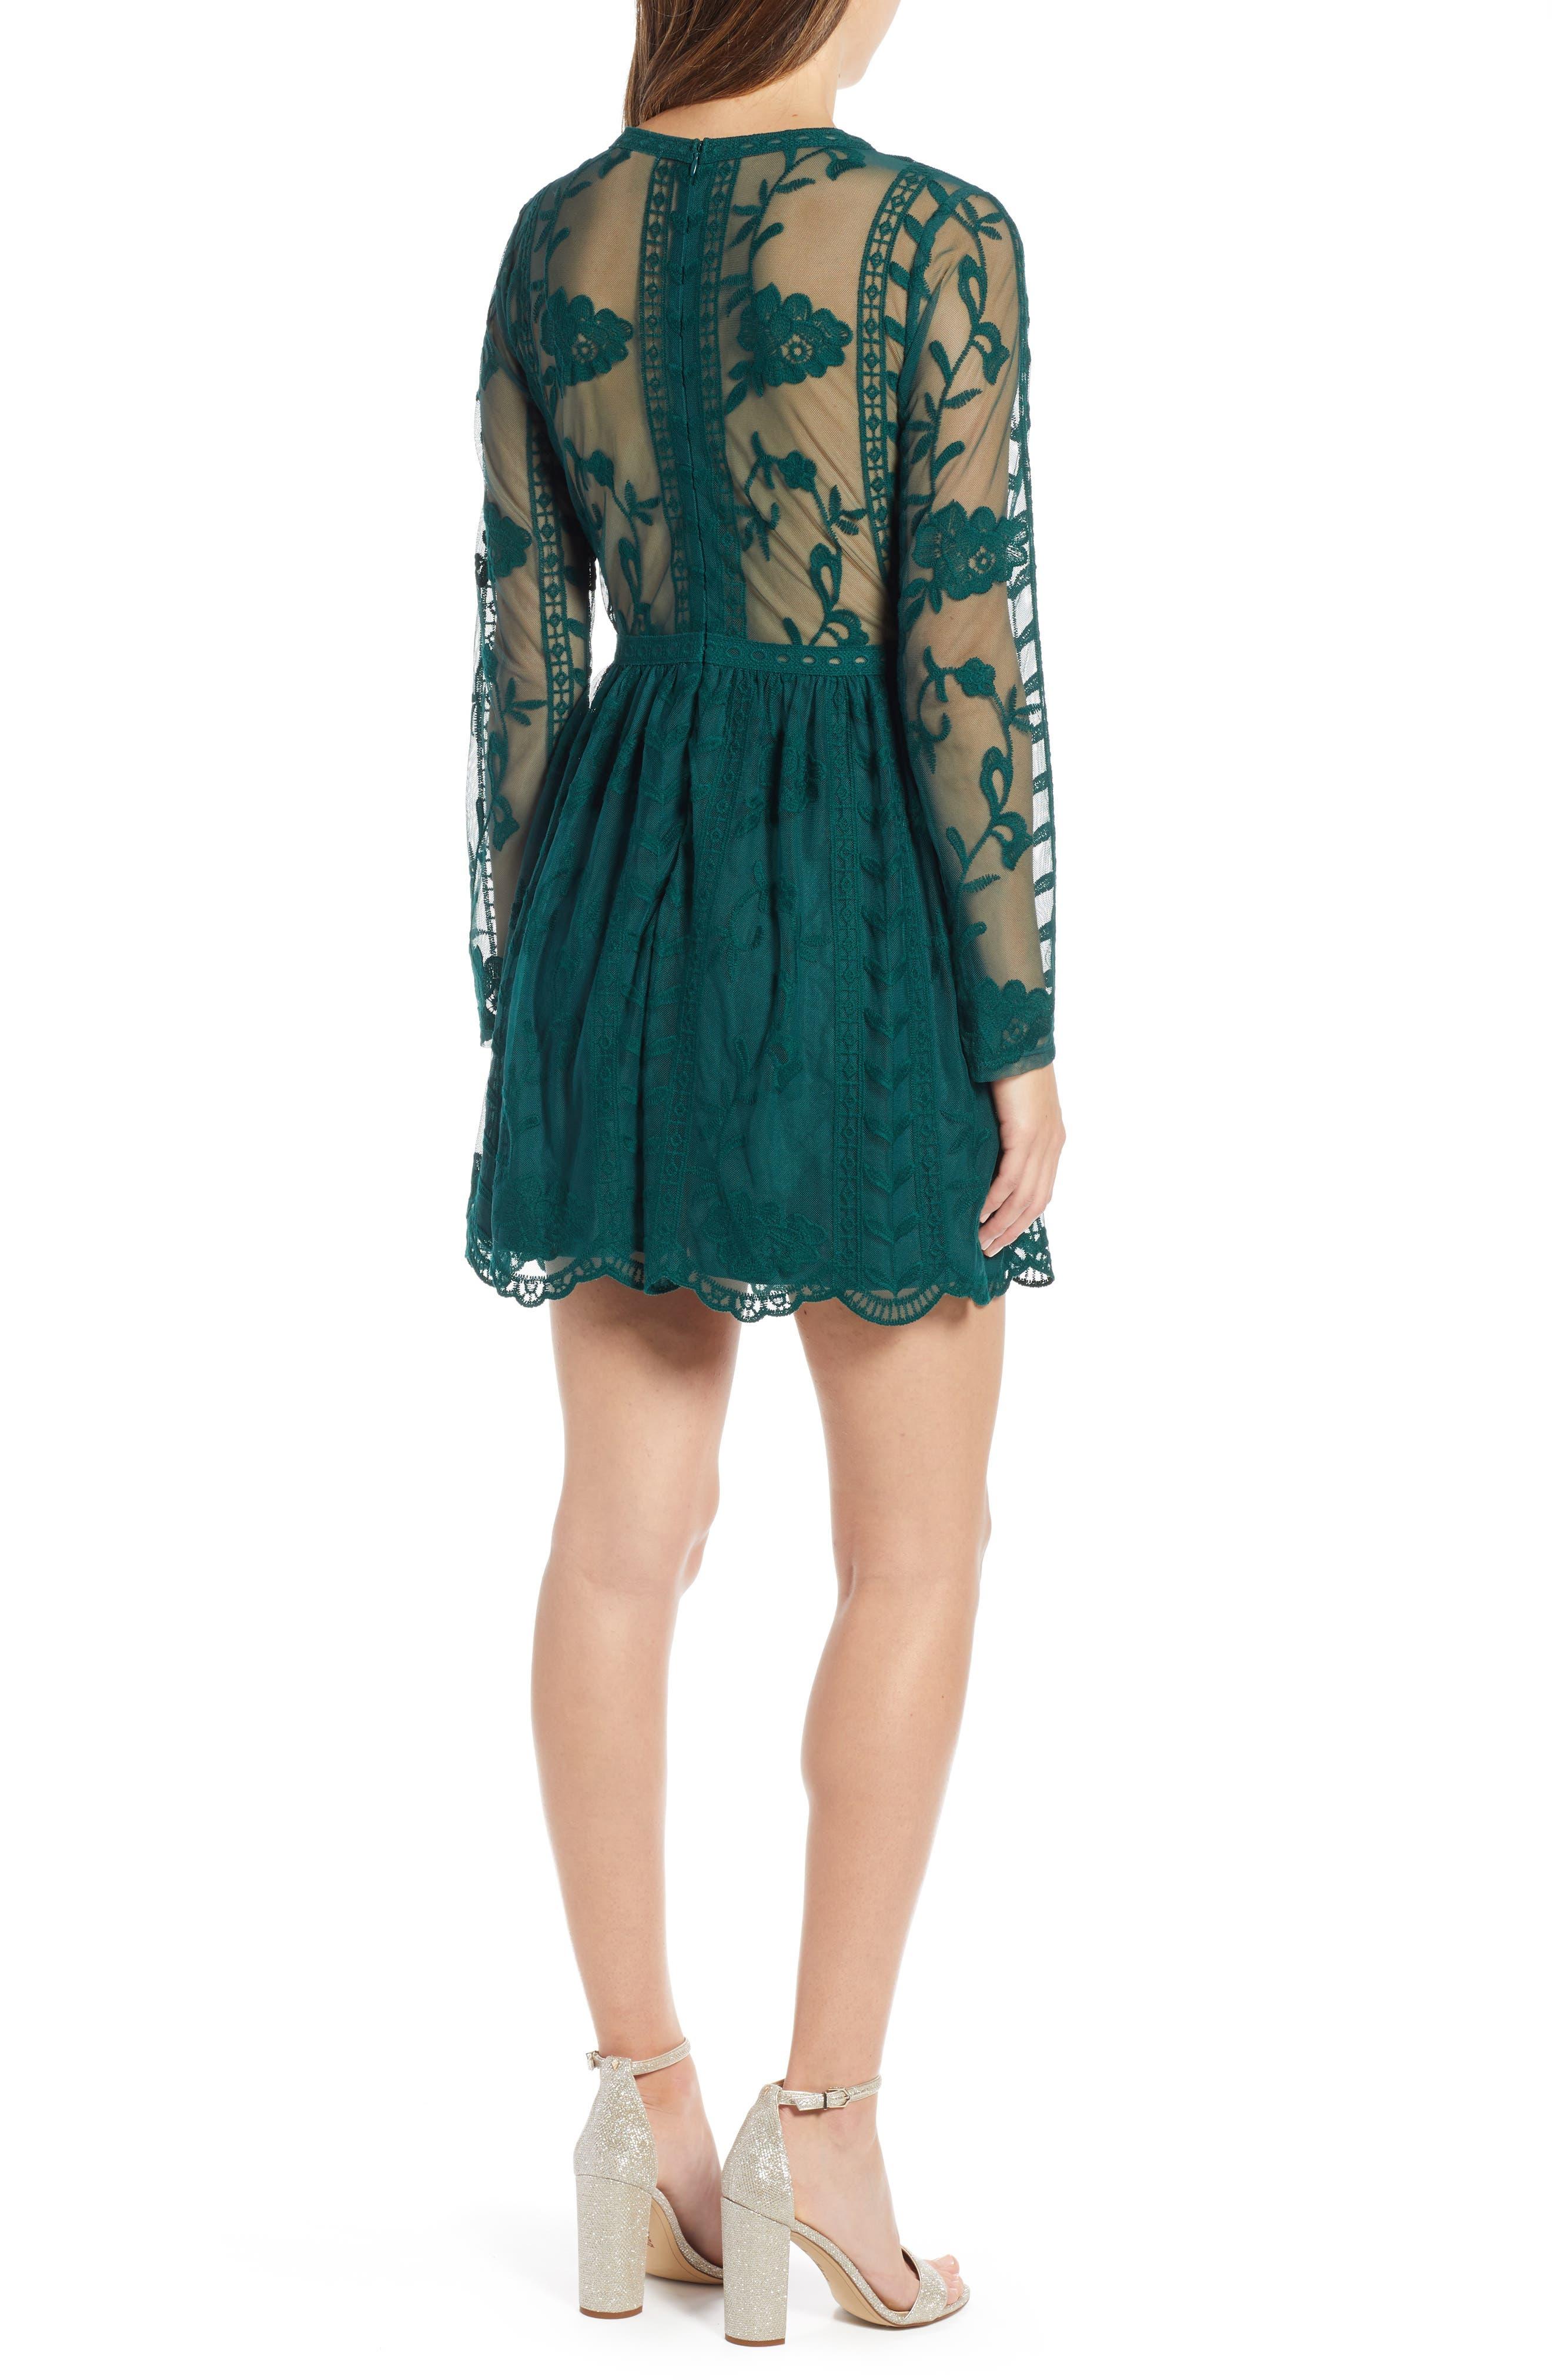 SOCIALITE,                             Long Sleeve V-Neck Lace Dress,                             Alternate thumbnail 2, color,                             300